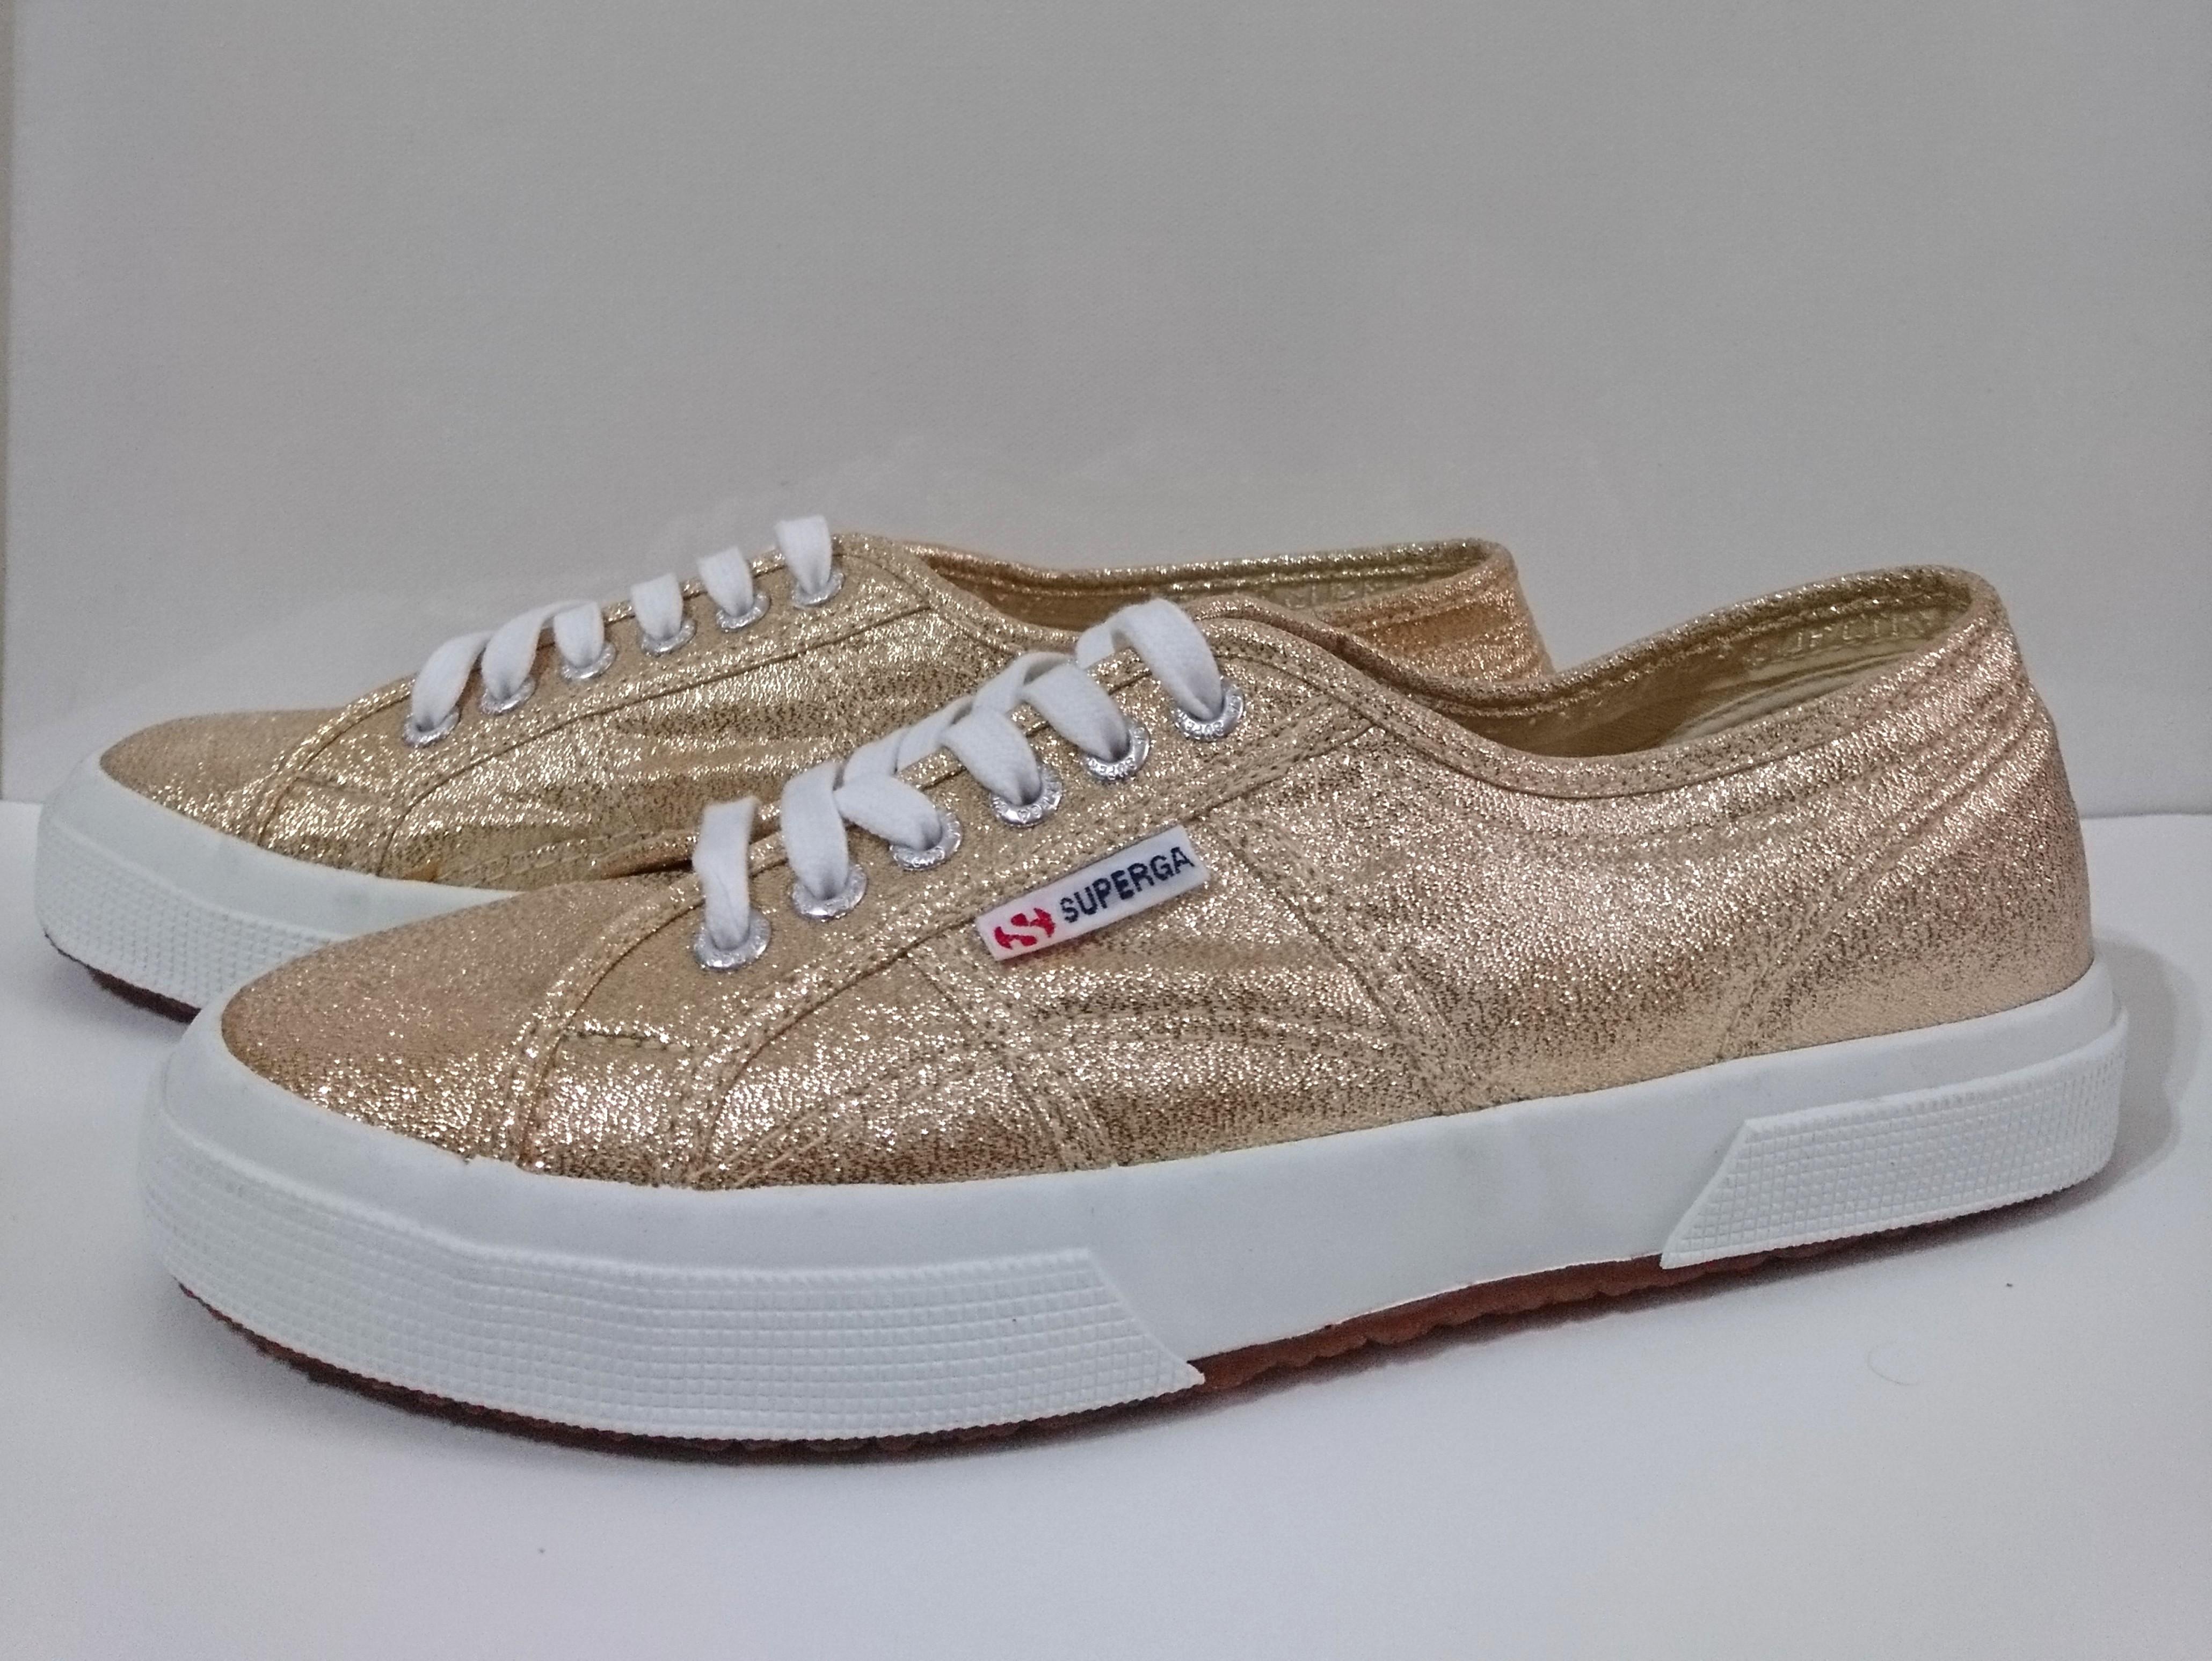 37723eb4fef56 BN Superga Classic Lamew Gold, Women's Fashion, Shoes, Sneakers on ...